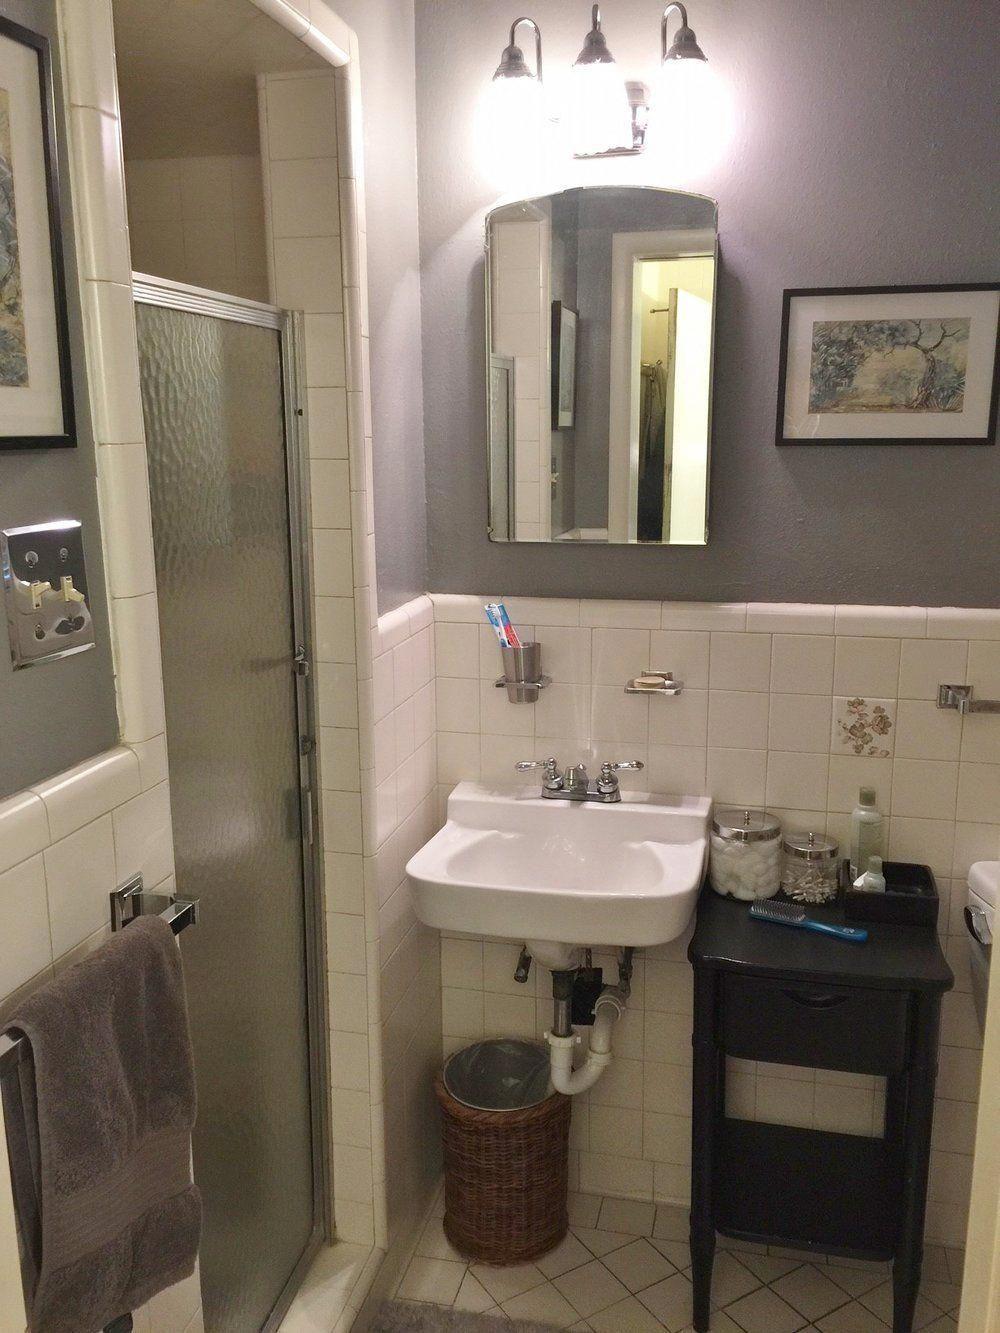 Photo of roto-rooter plumbing & drain,  plumbing ombudsman,  aries plumbing 63123,  plumb…